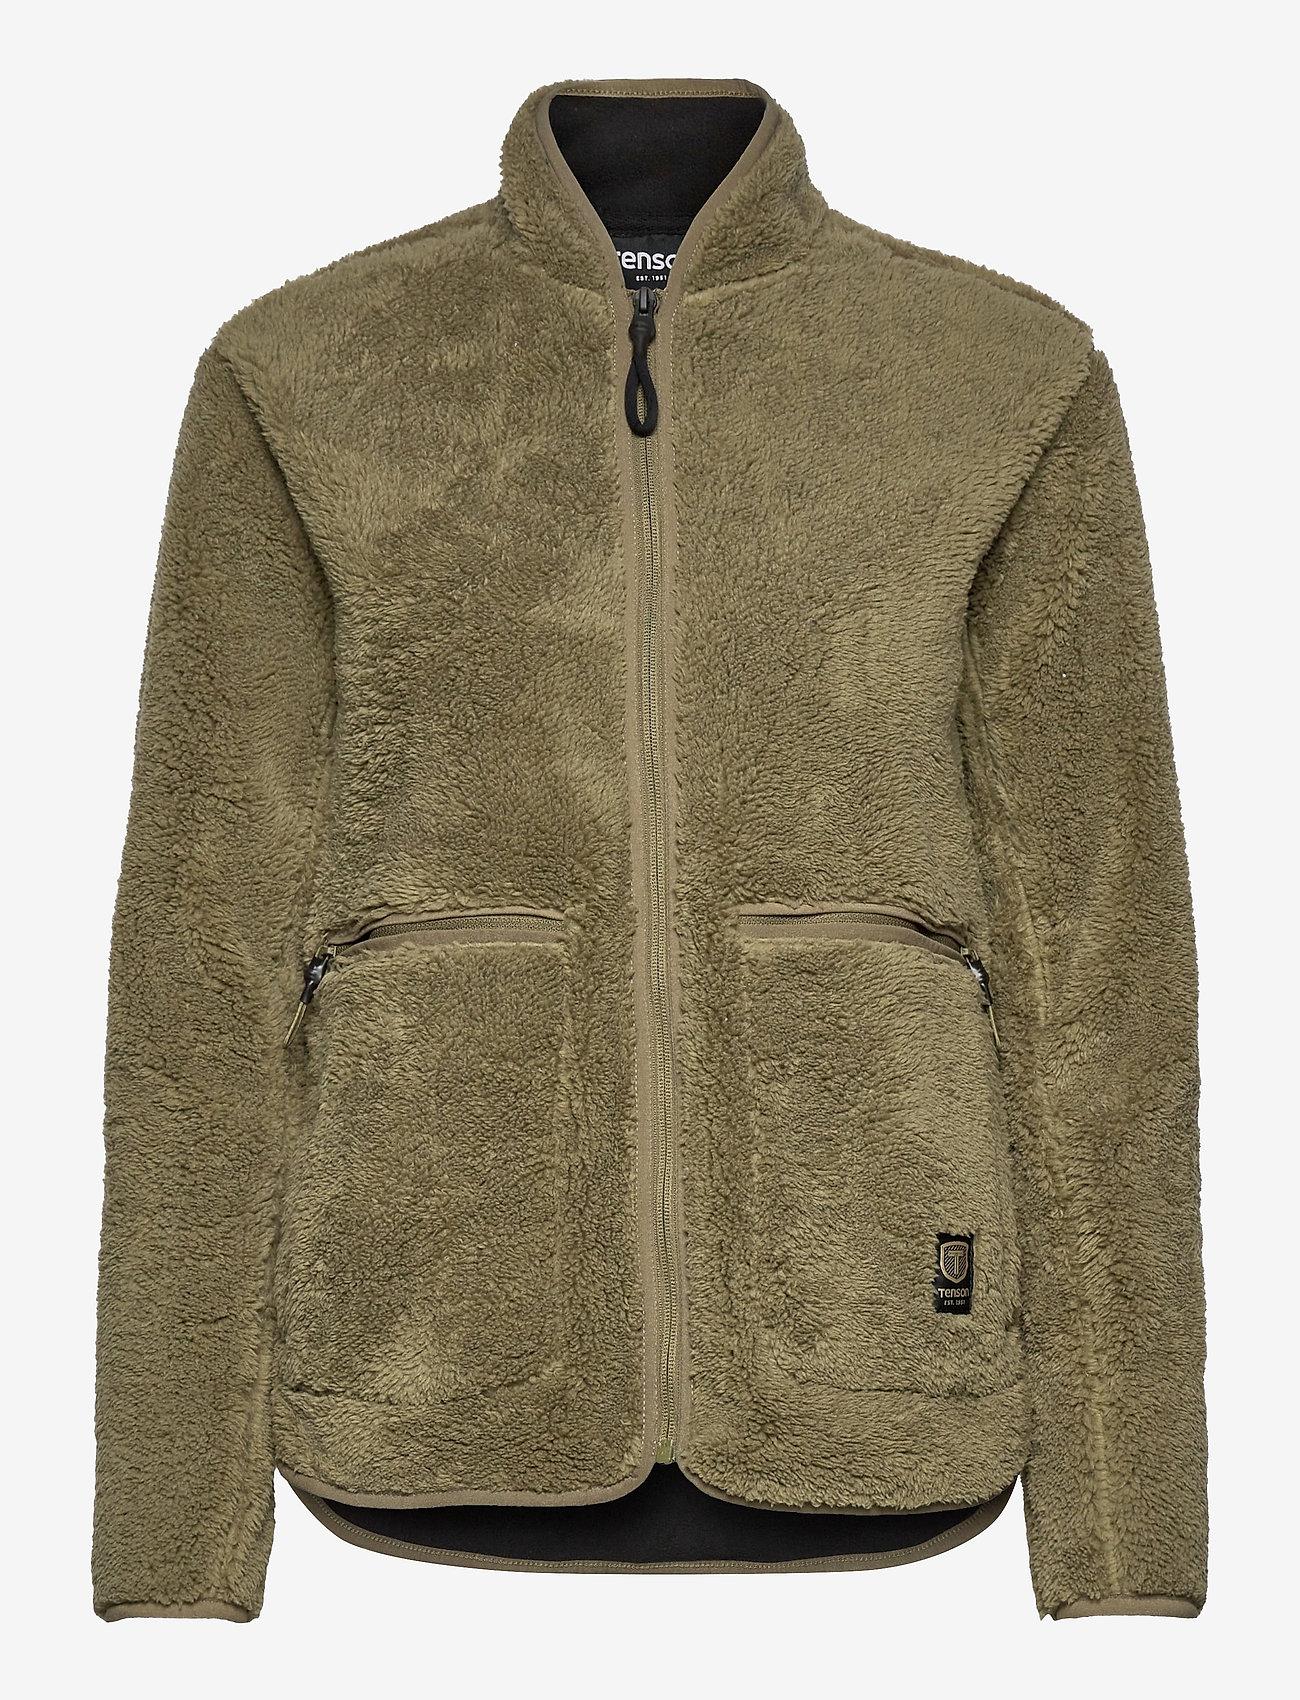 Tenson - Nechako Pile Jkt W - outdoor & rain jackets - olive - 0